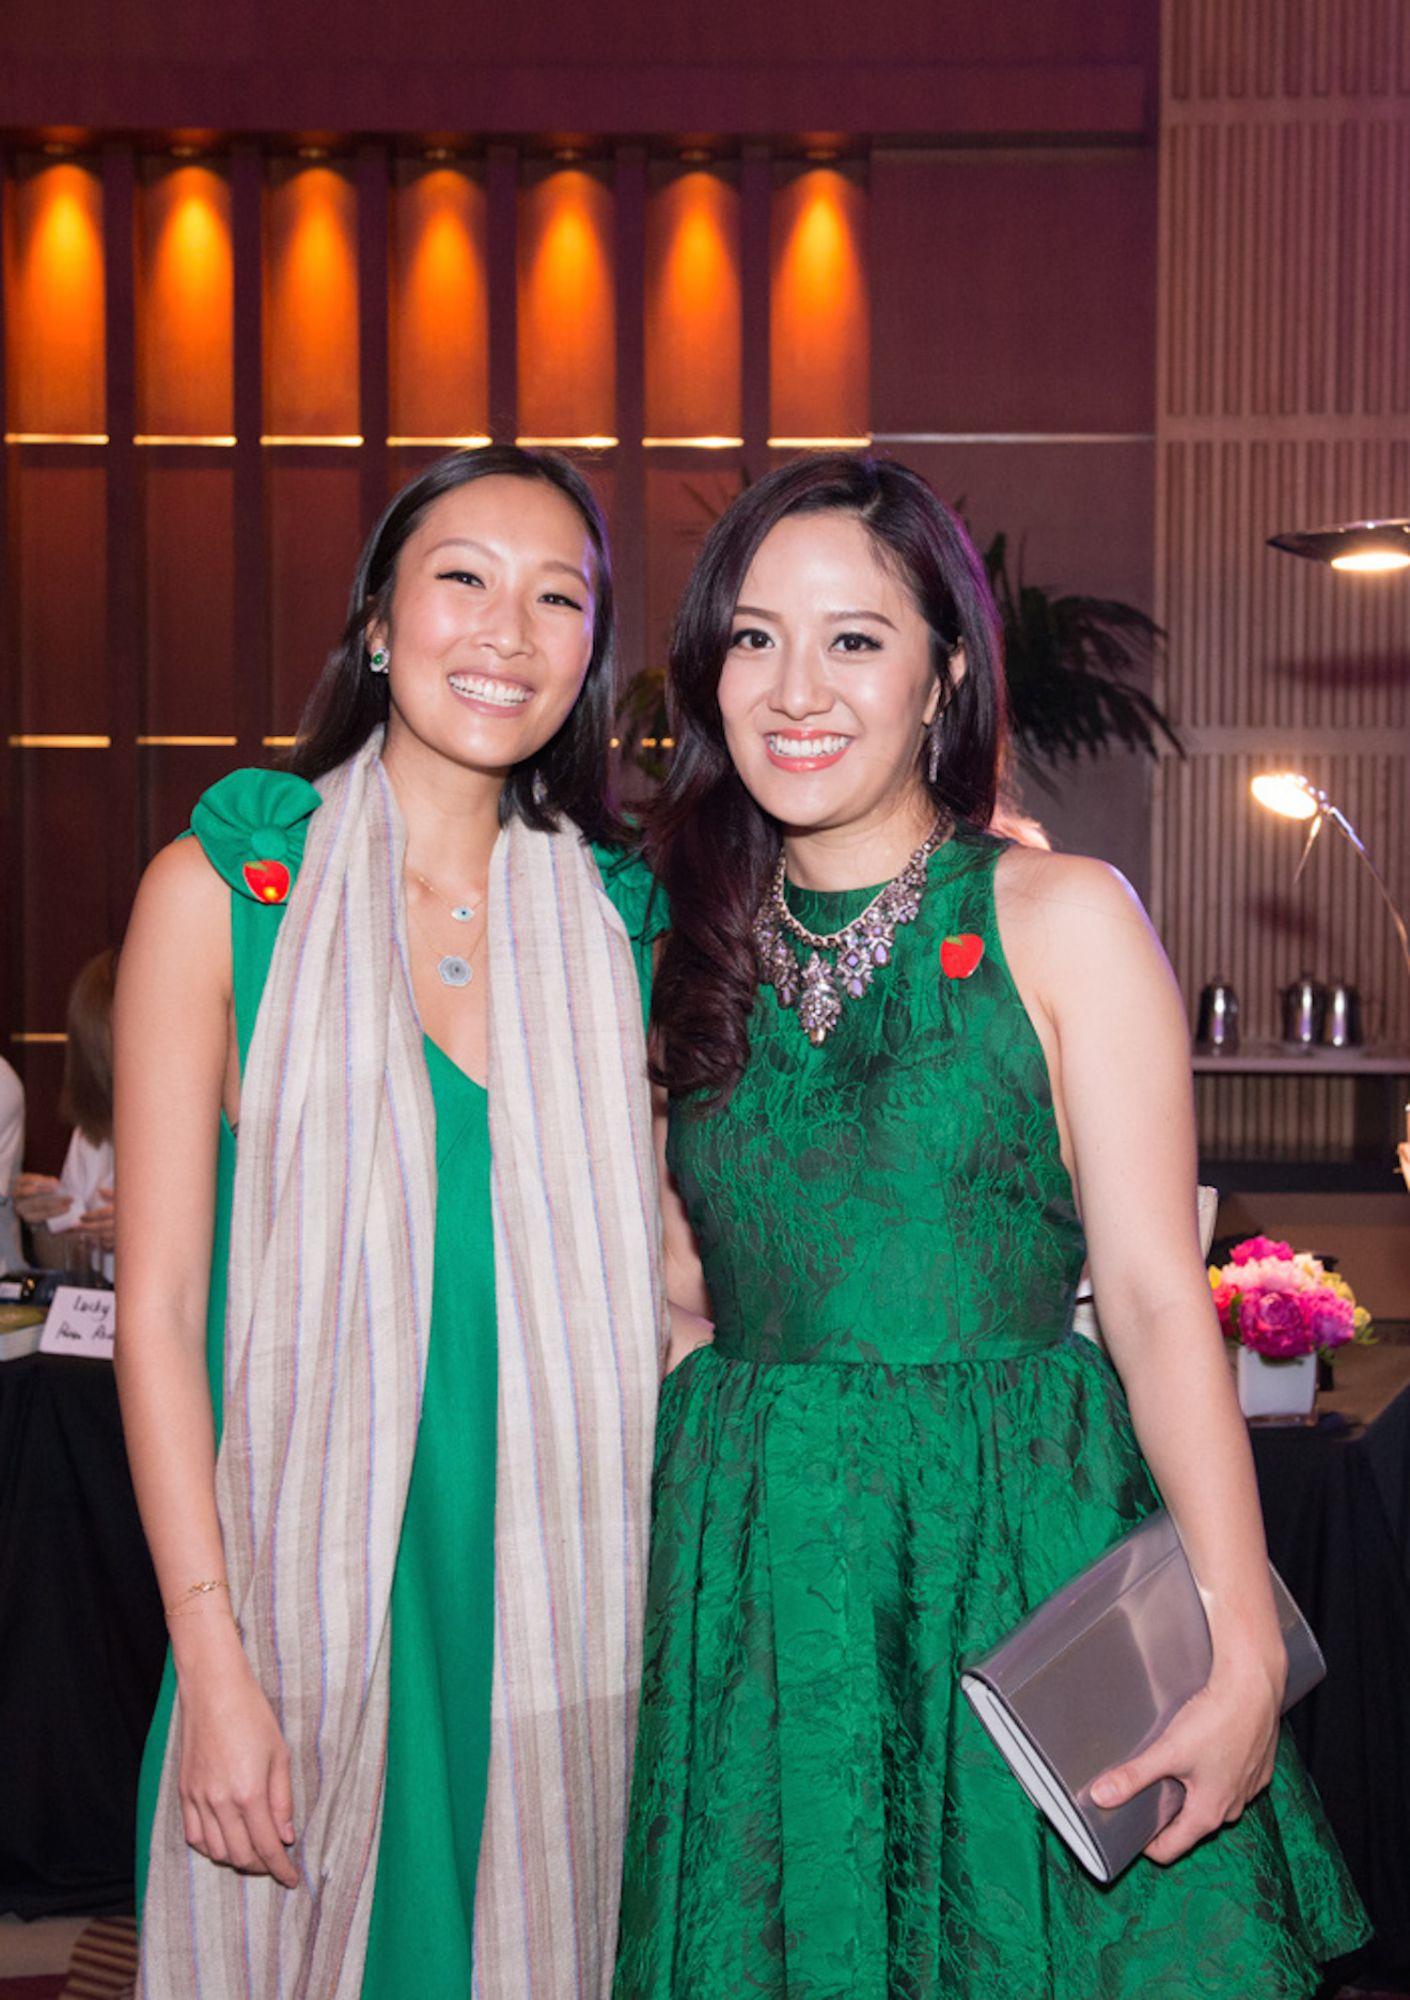 Chelsea Chau and Jenny Chau